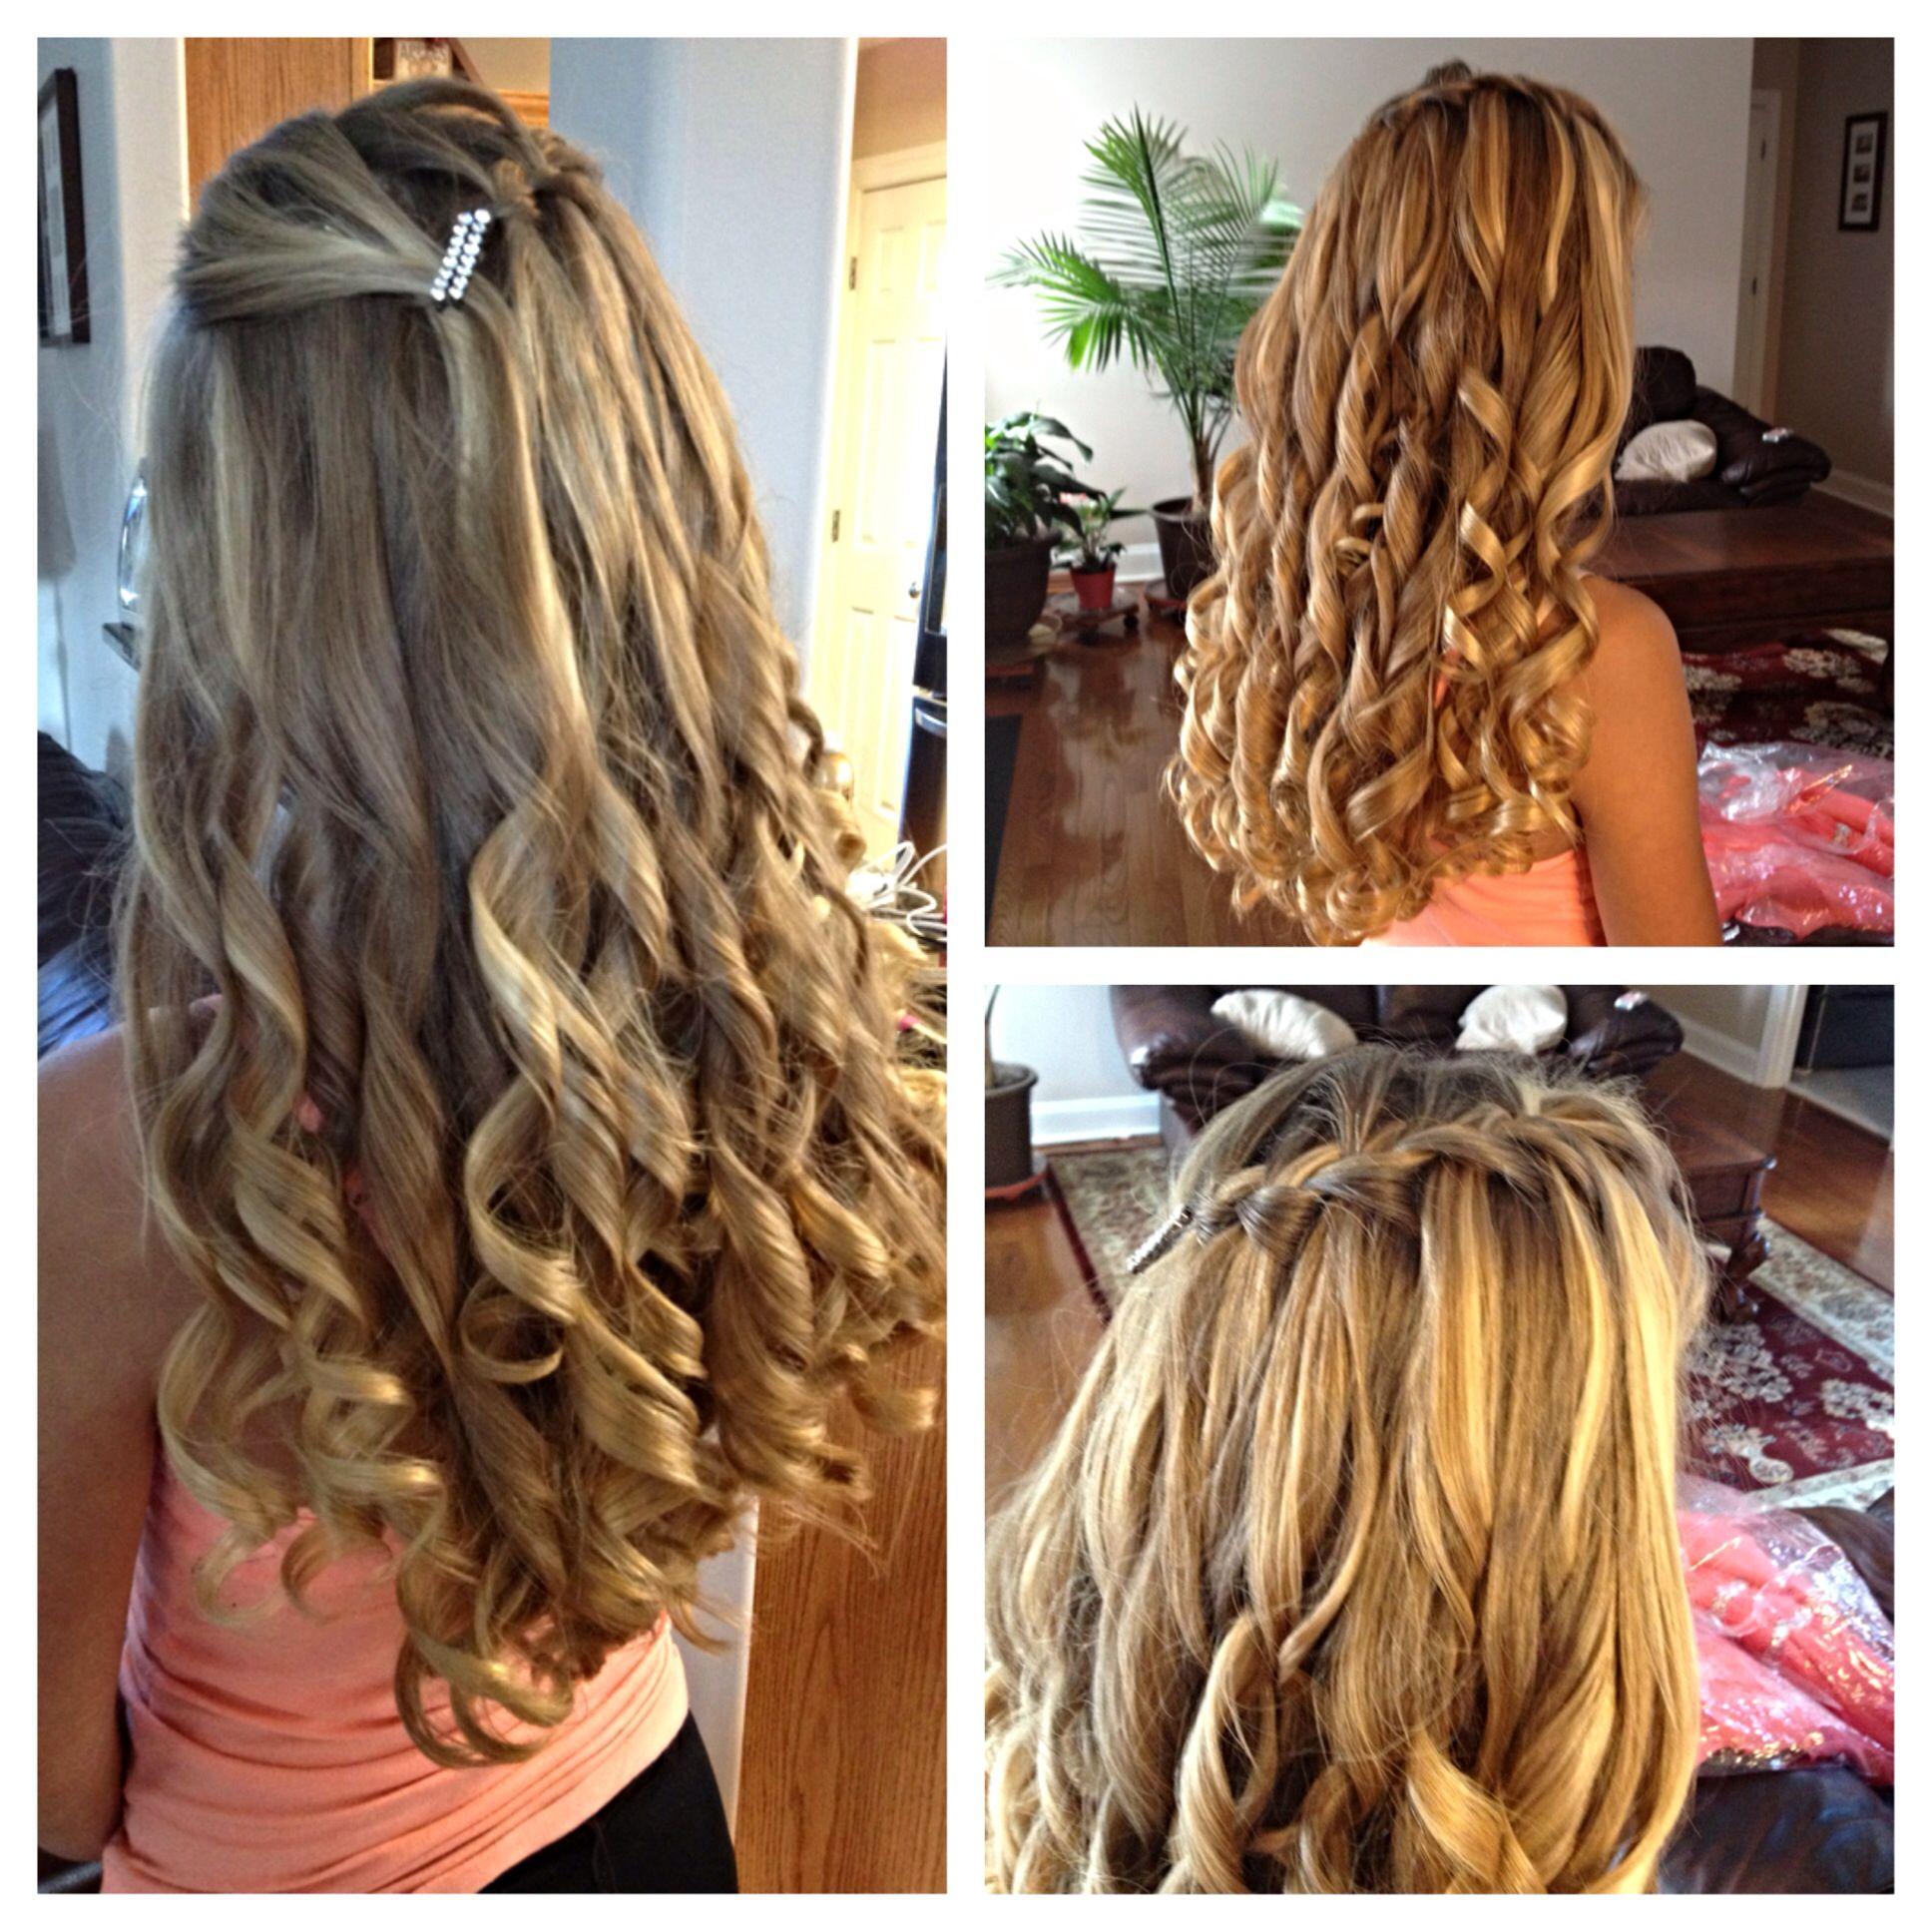 Hair For 8th Grade Dance Waterfall Braid Kaylawaltershair Cute Hairstyles Hair Styles Graduation Hairstyles